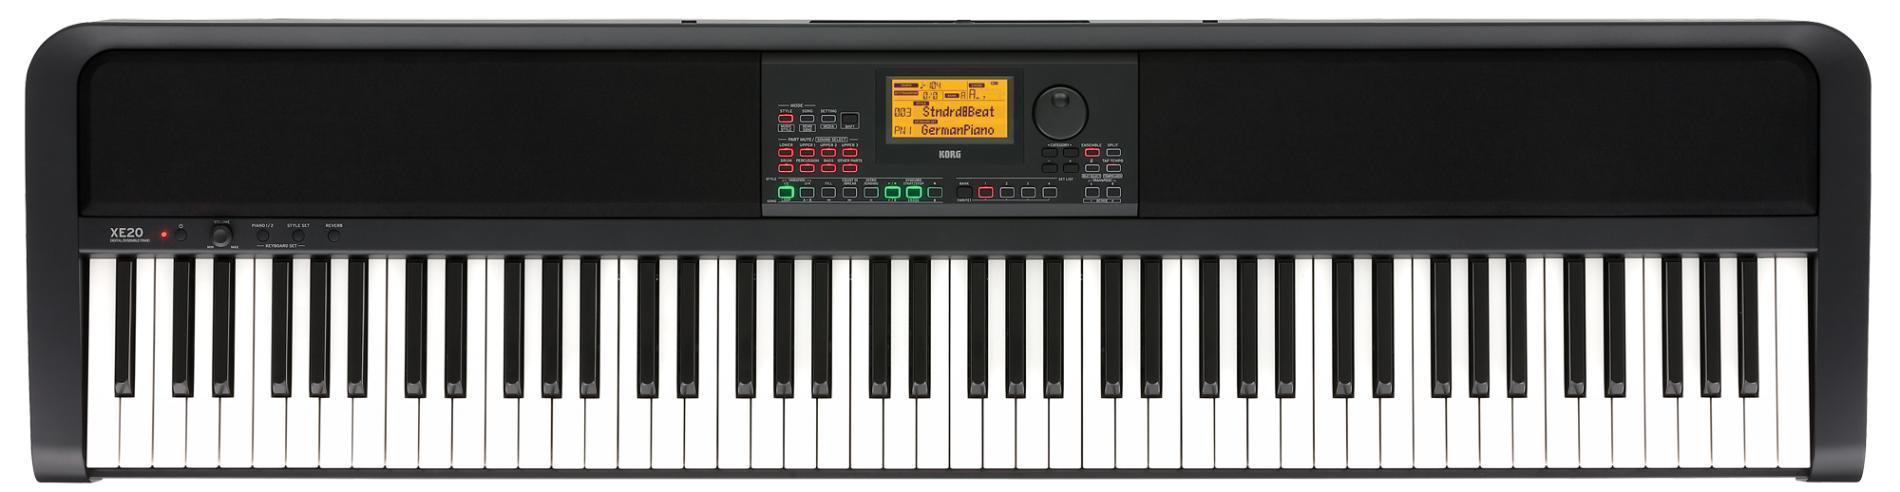 XE20 Digitalpiano B-Ware